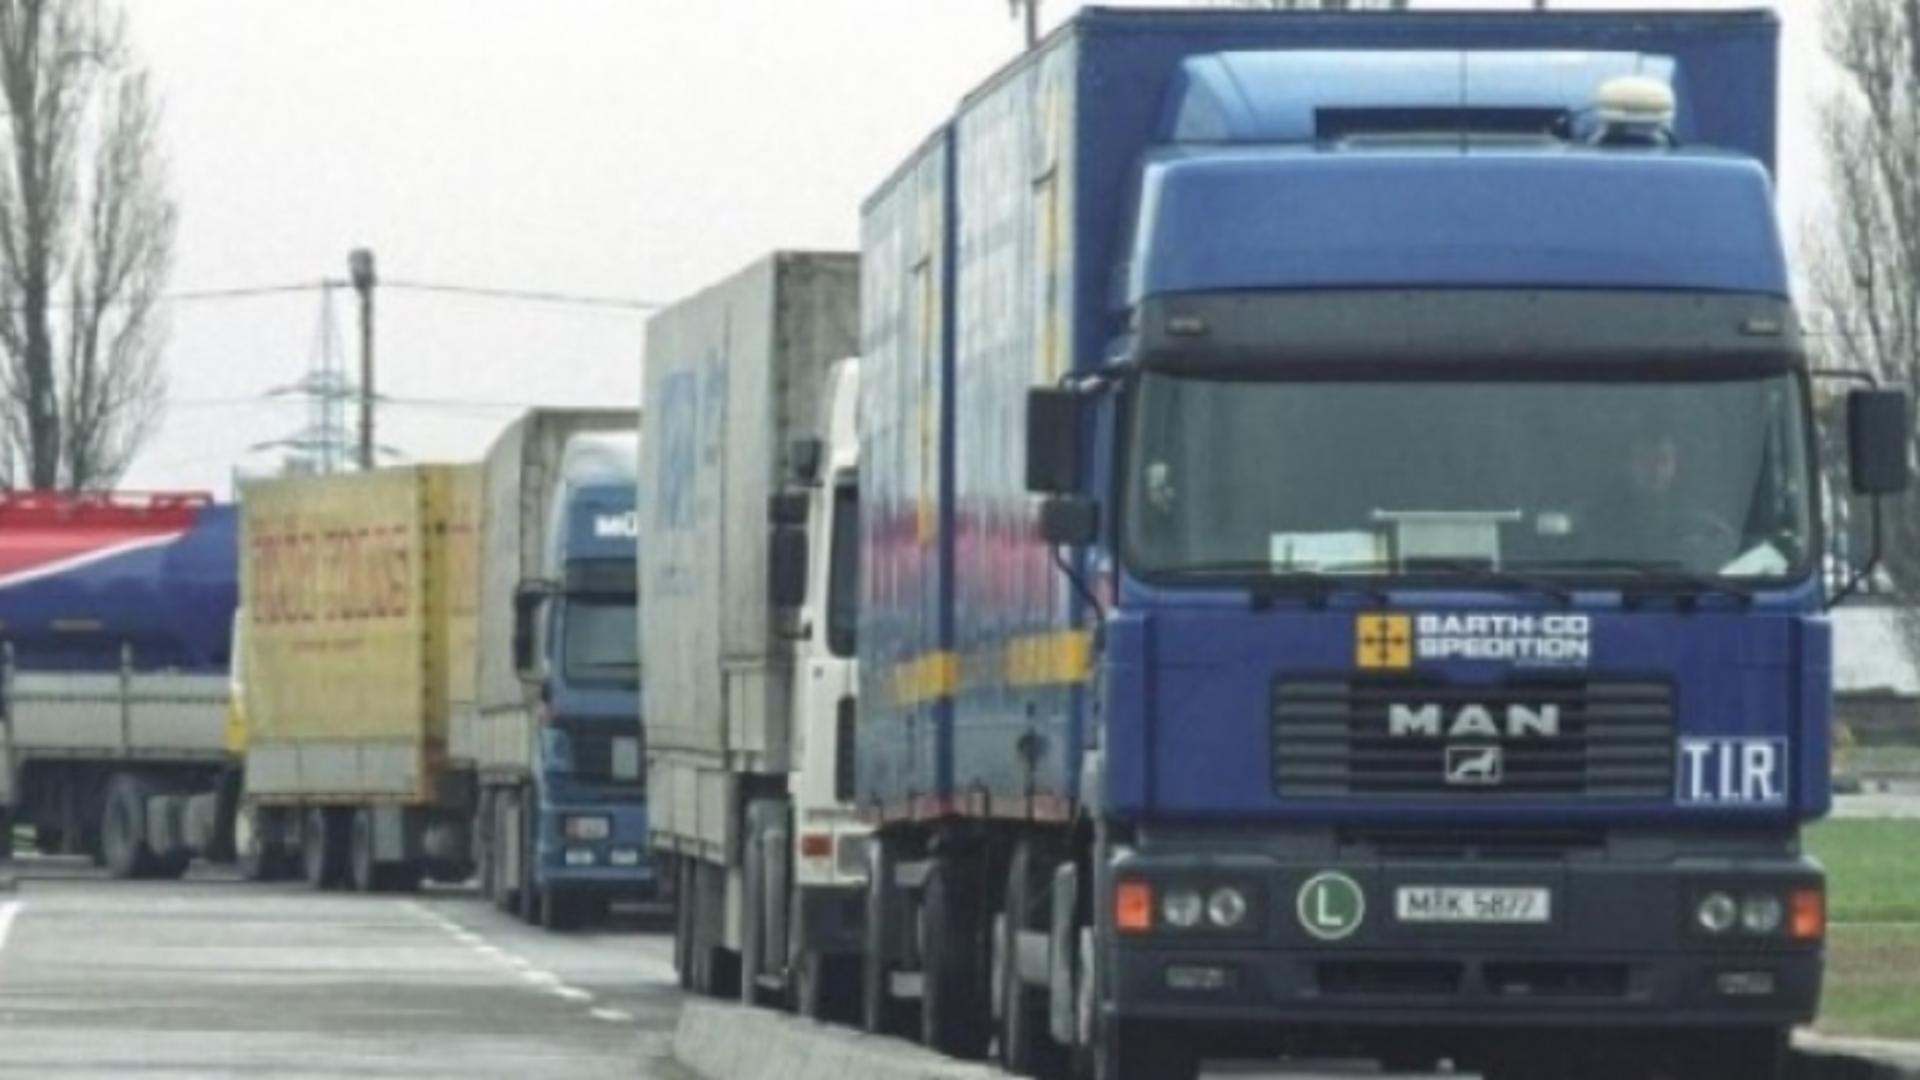 Șofer de TIR, atacat în Franța